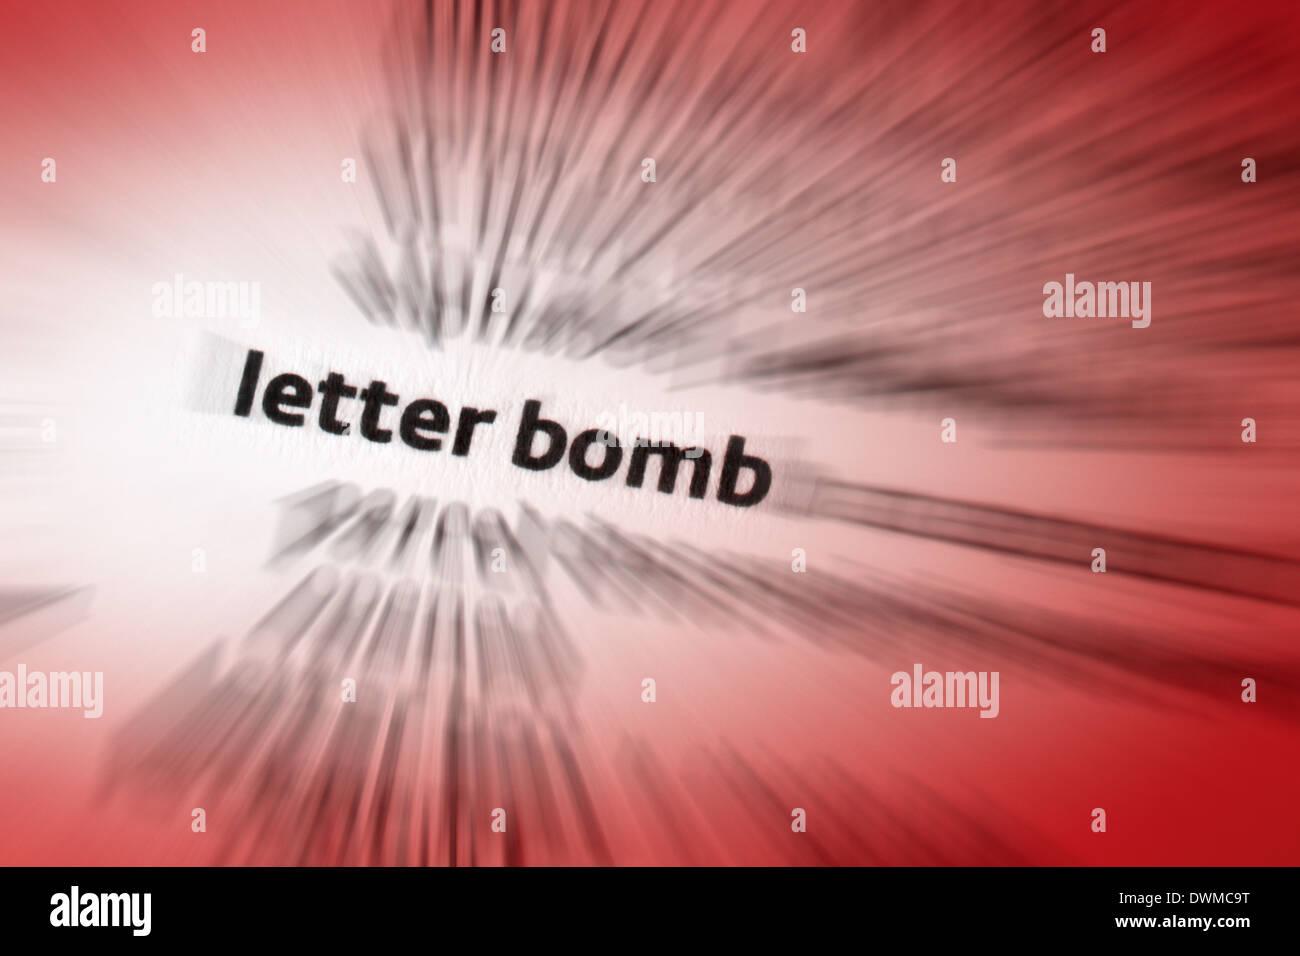 Letter bomb - Stock Image